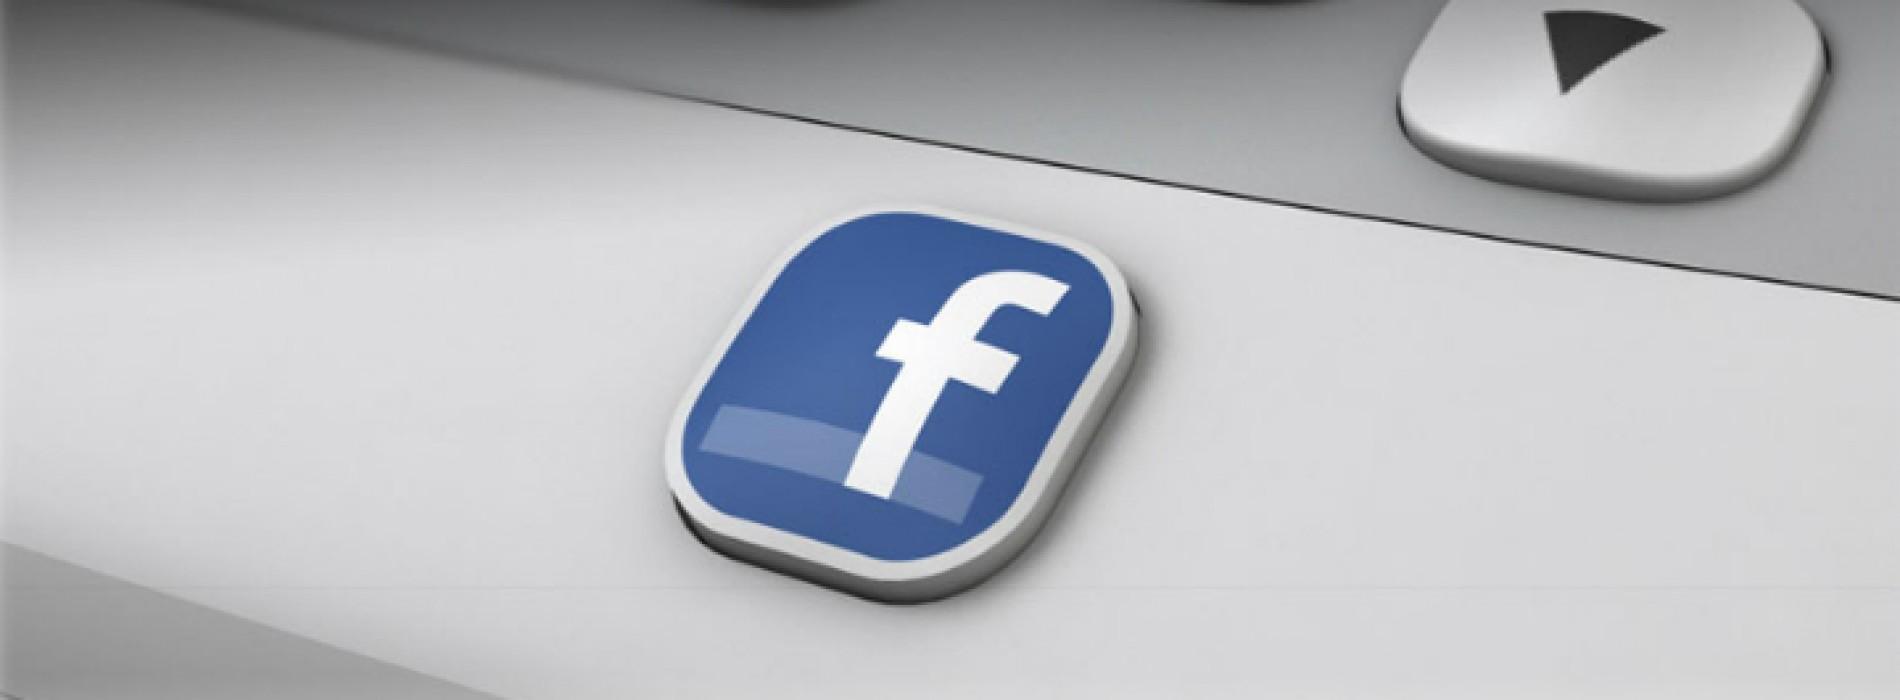 HTC Myst details confirmed for rumored Facebook phone